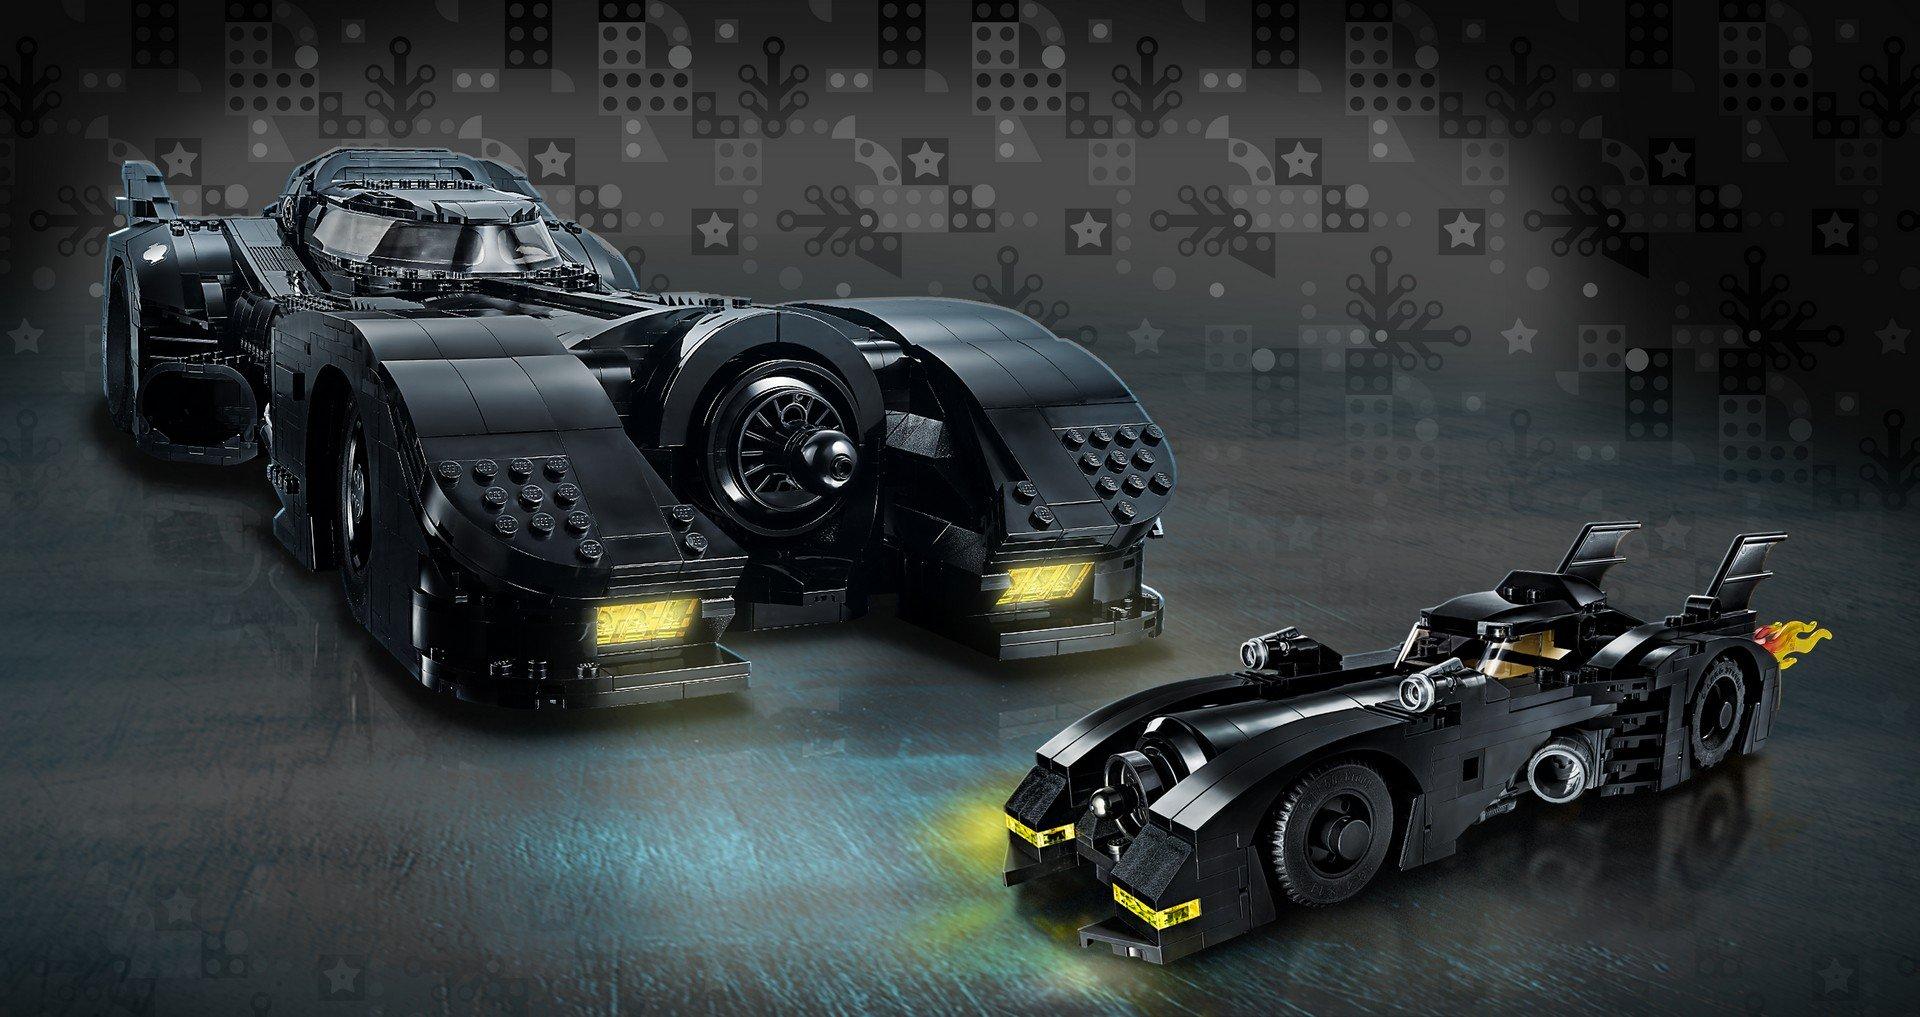 Lego-Batmobile-kit-1989-1